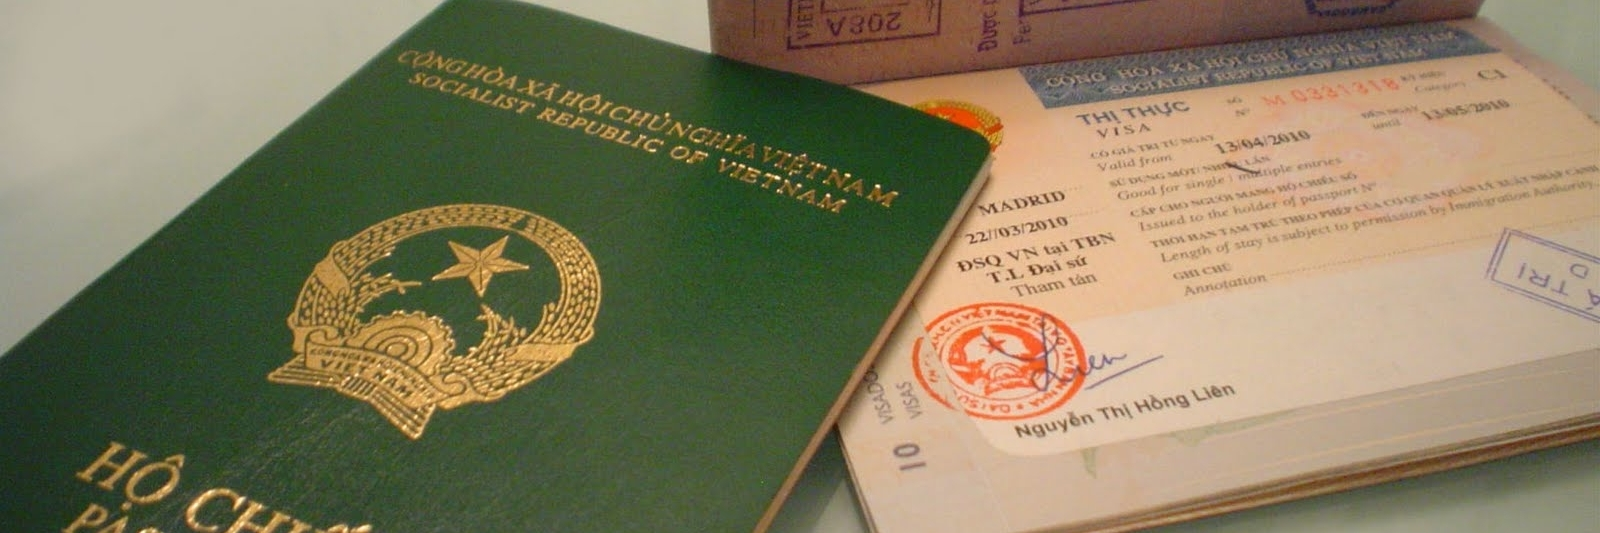 https://gody.vn/blog/visadulichnuocngoai/post/kinh-nghiem-lam-ho-chieu-passport-danh-cho-nguoi-ngoai-tinh-6325